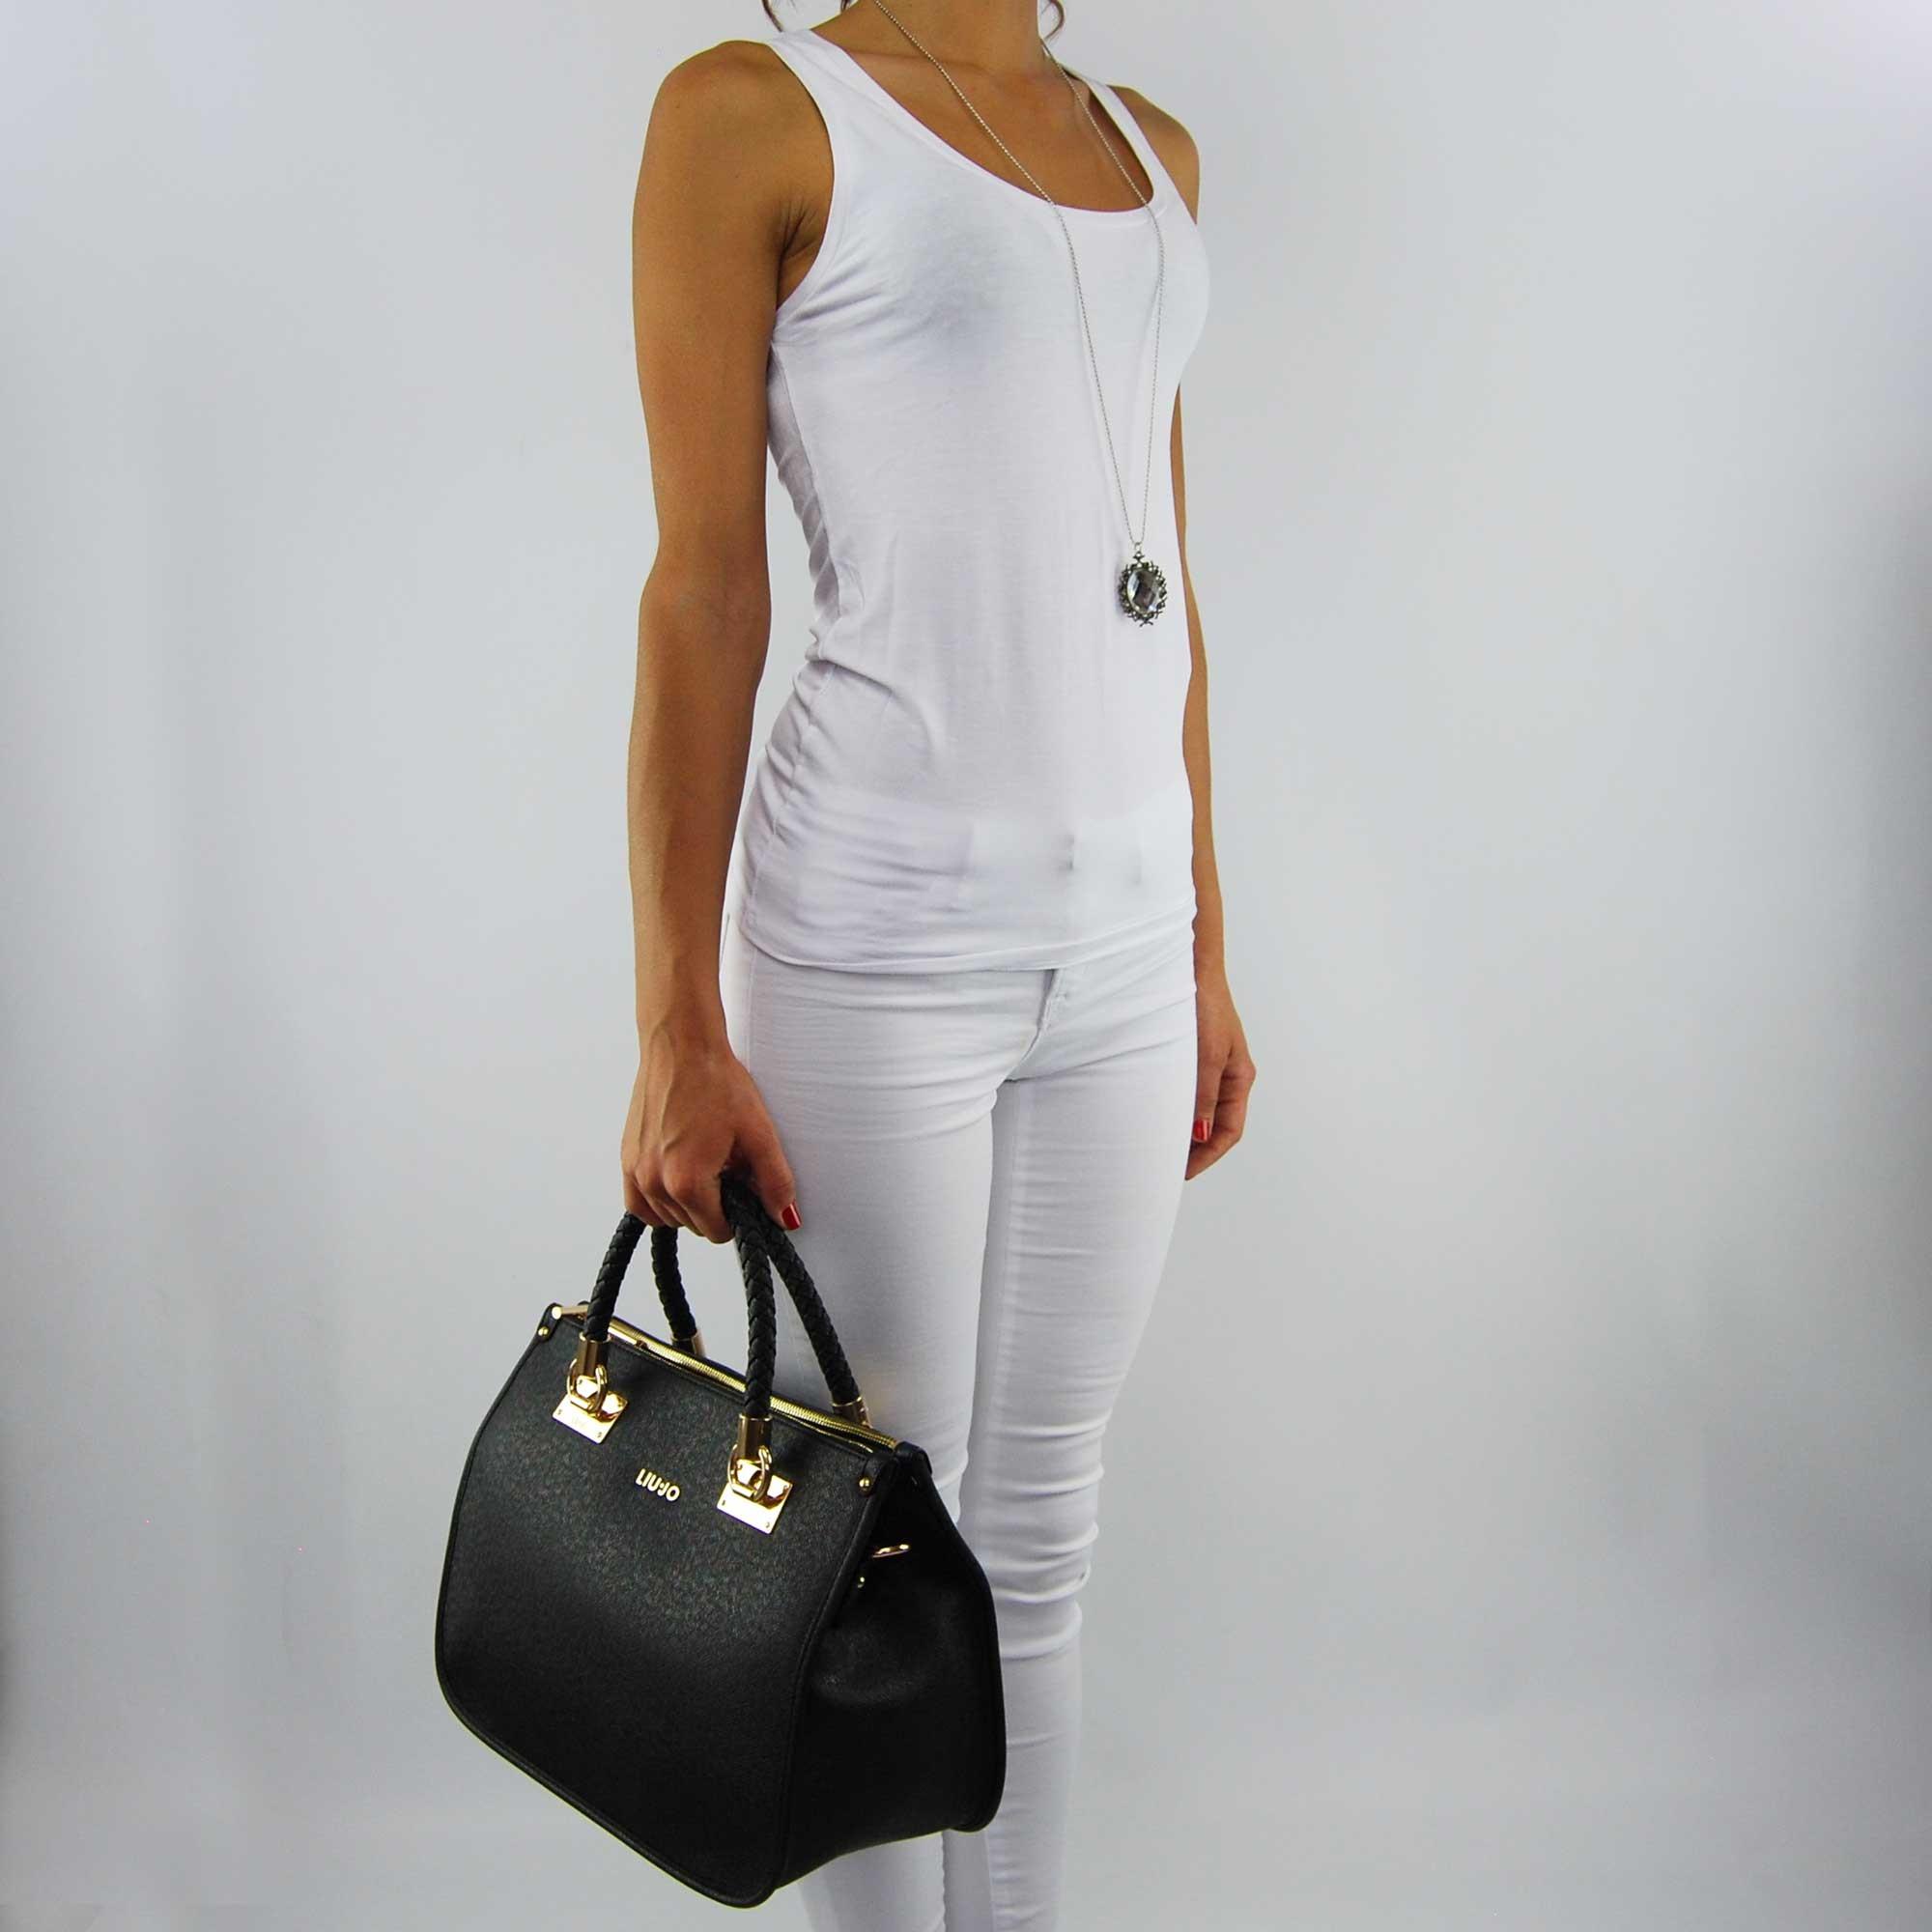 Shopping bag Liu Jo m quandrata anna black 4d7db441c73